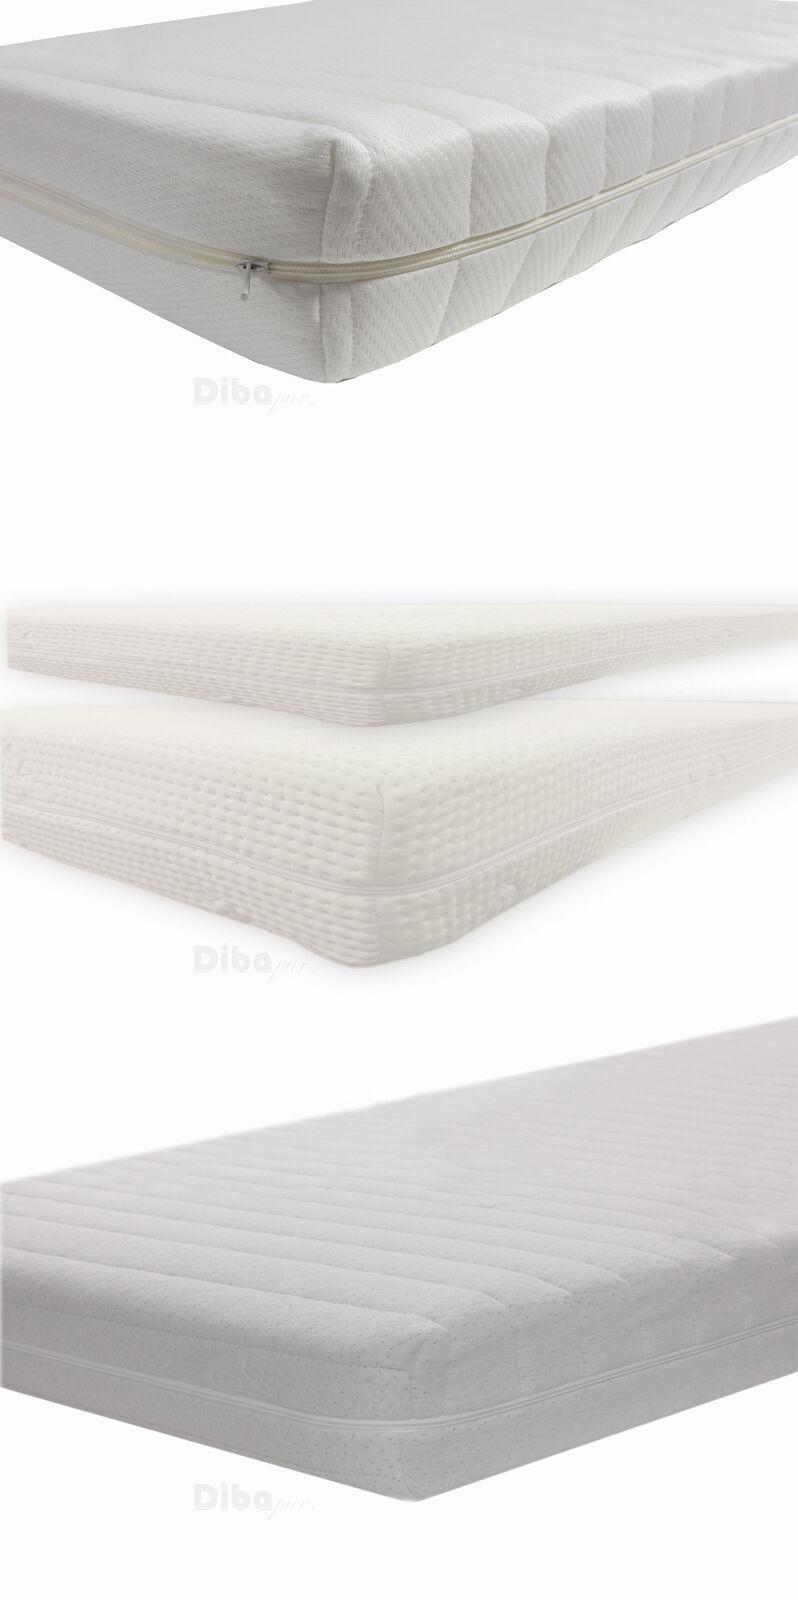 Kalt-schaum matratze 100x200 120x200 140x200 150x200 160x200 180x200 200x200